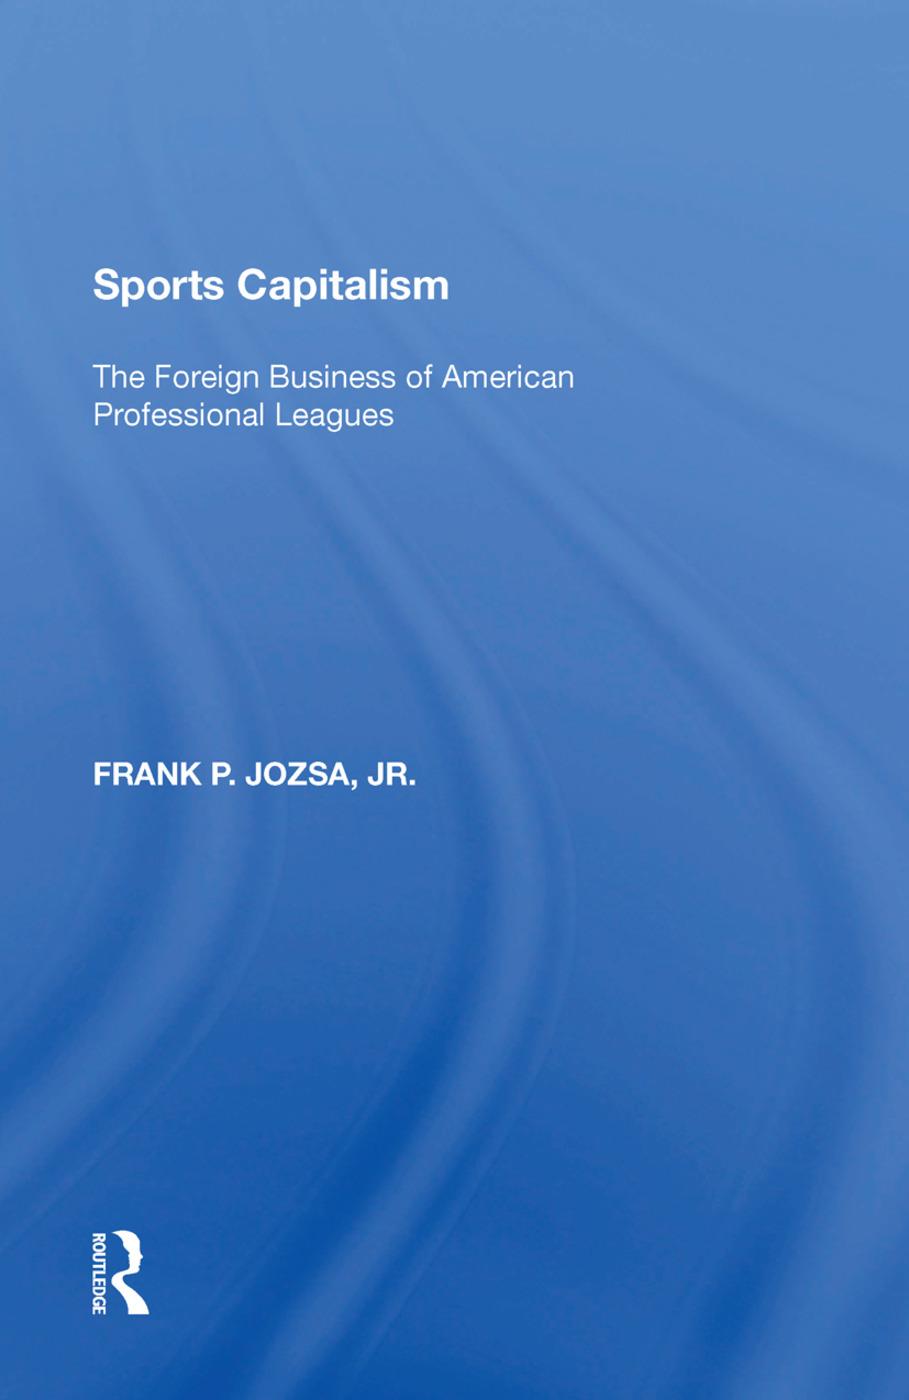 Sports Capitalism